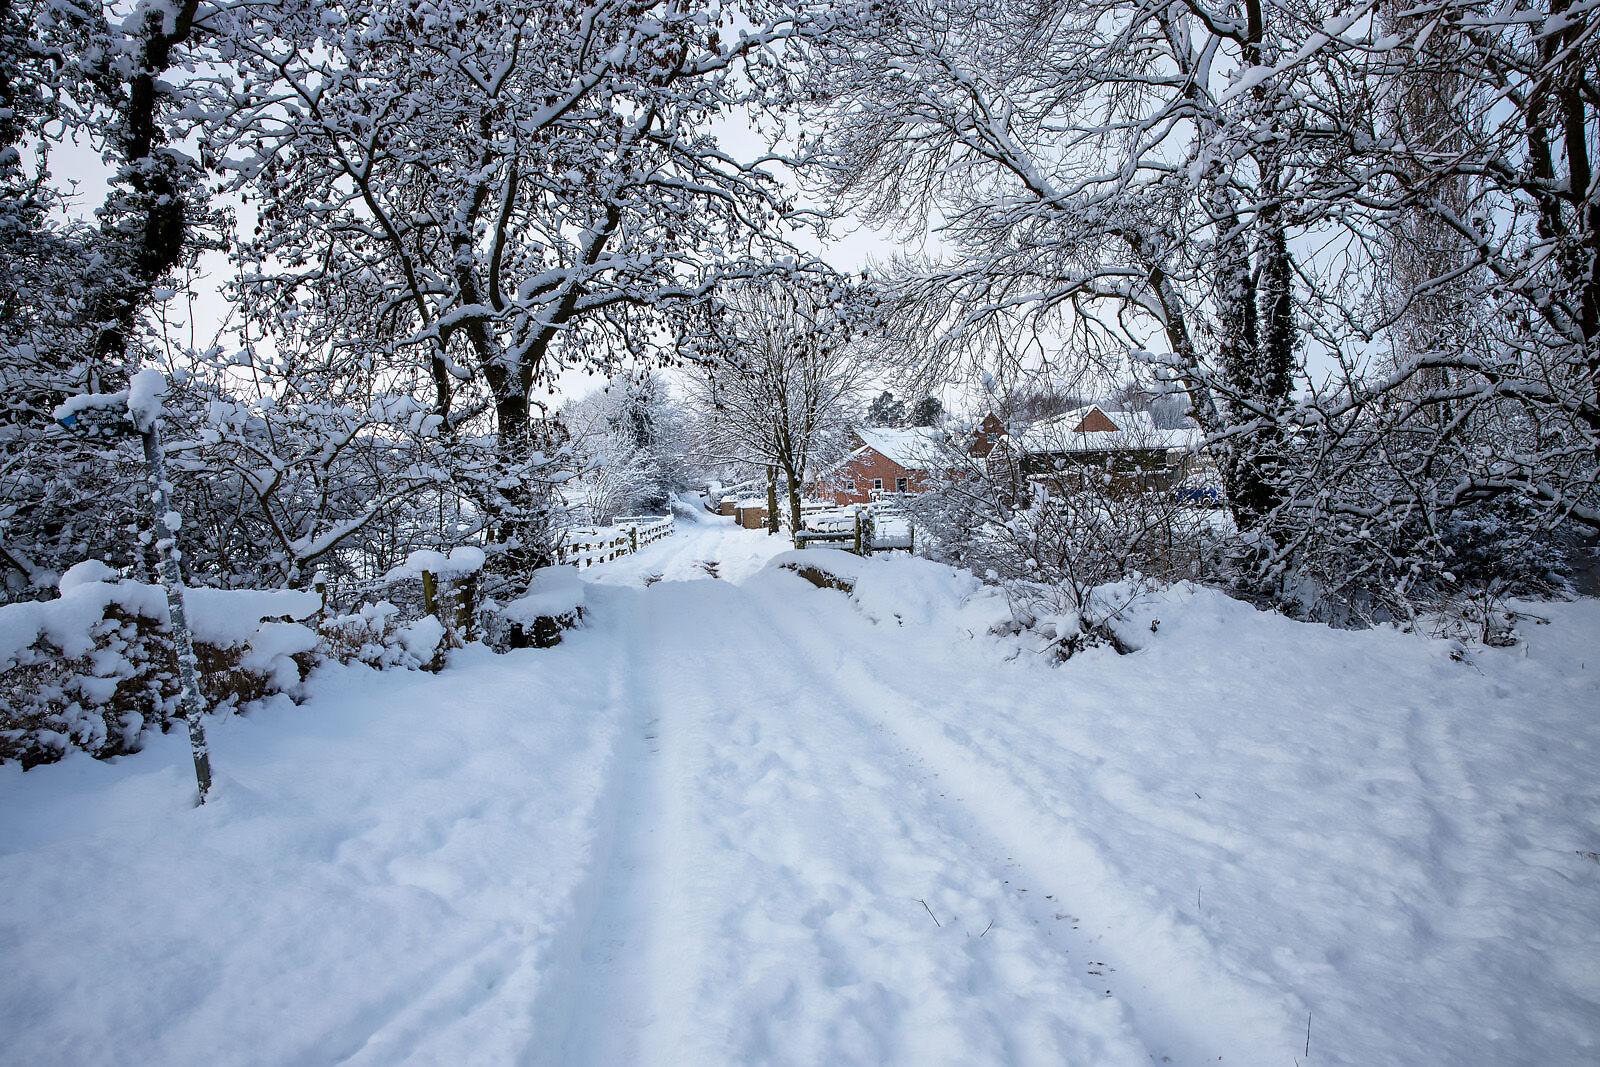 Rutland Winter has Arrived!